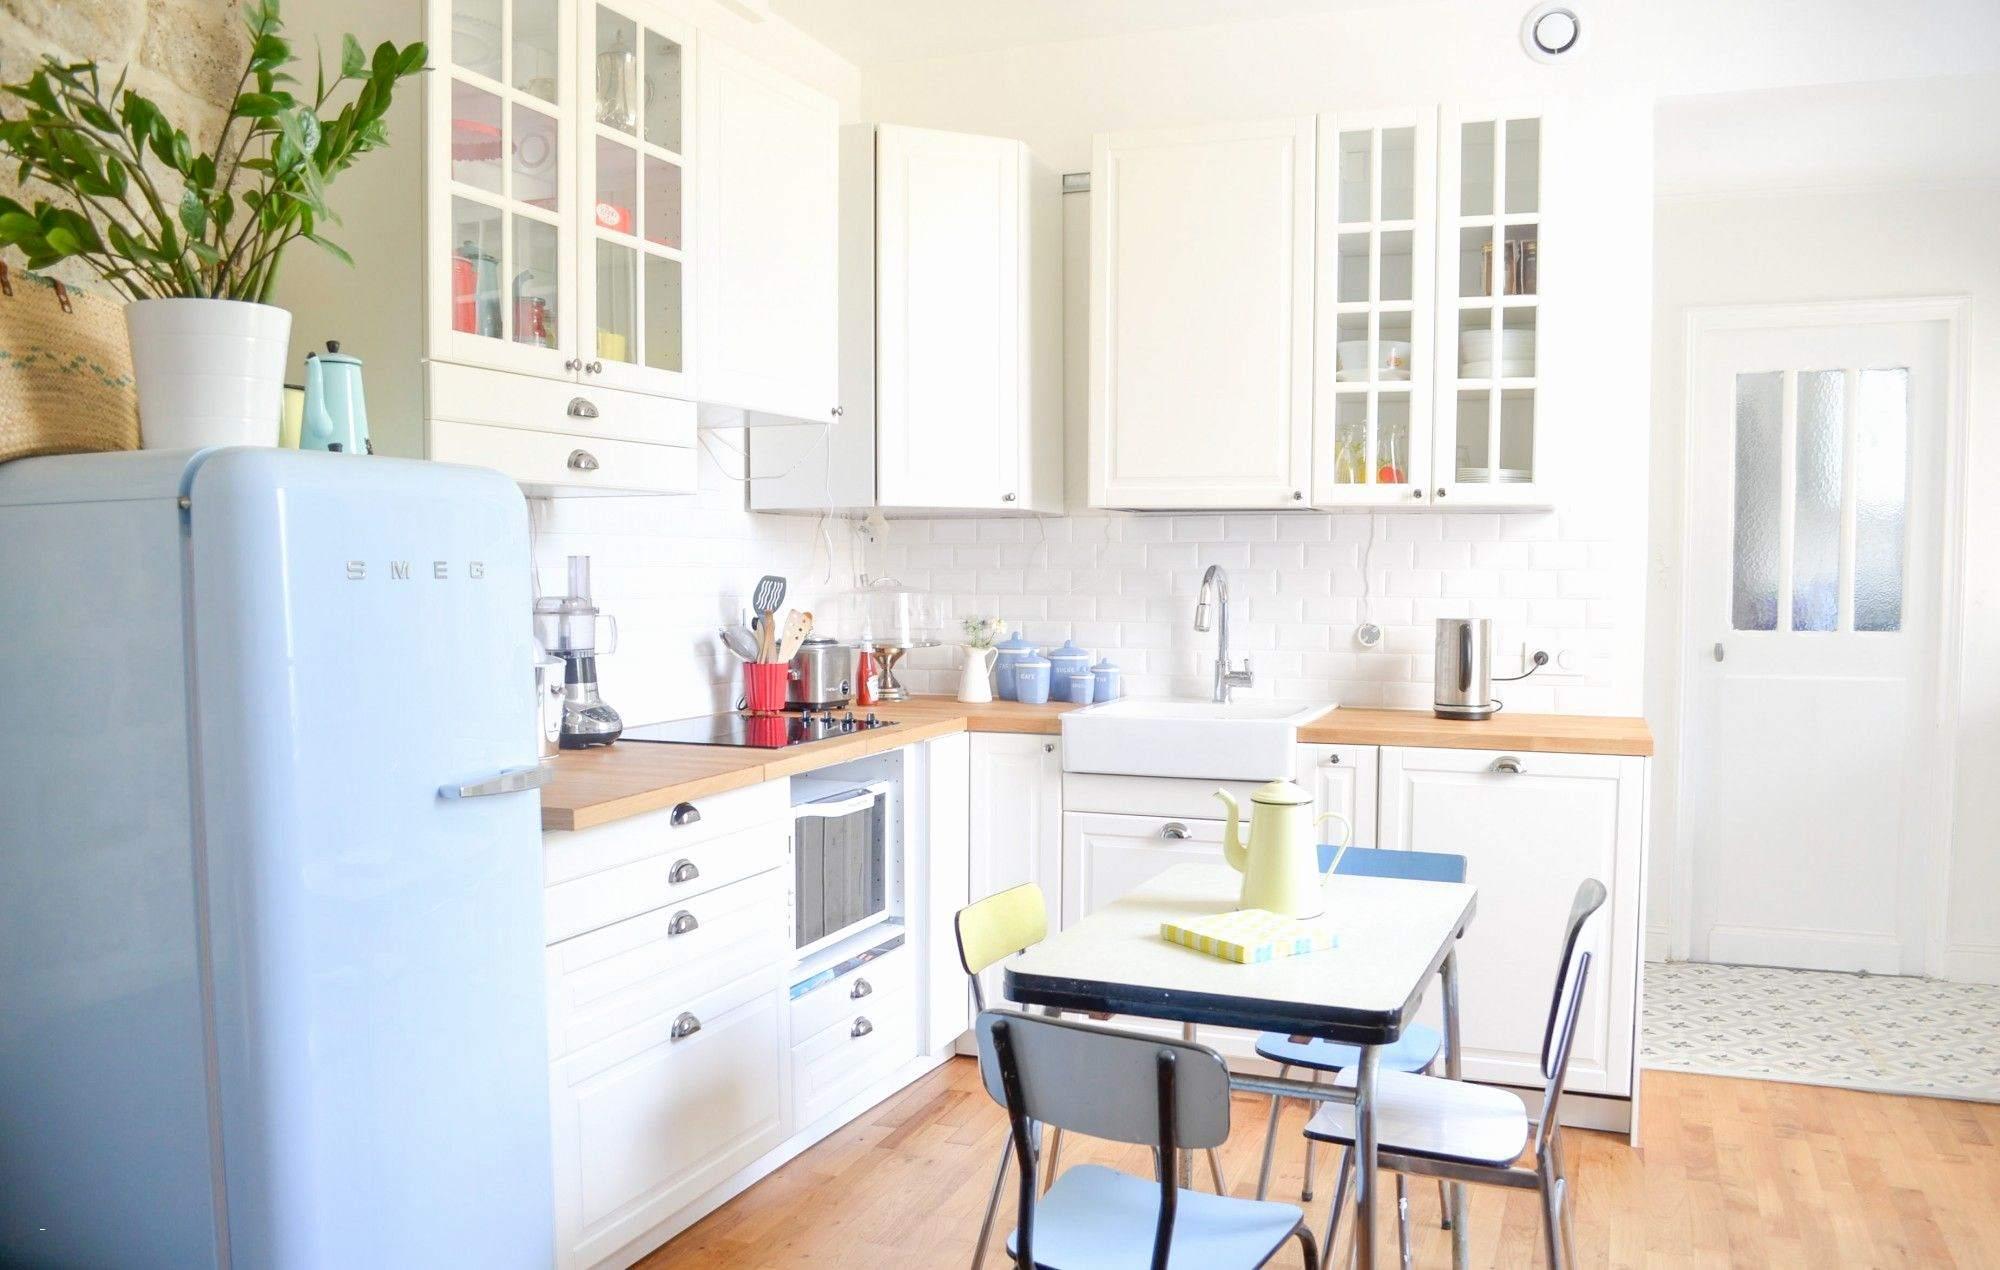 Cuisine Bodbyn Grise Ikea Meilleur De Stock Cuisine Ikea Bodbyn Nouveau Cuisine Style Provencale Ancienne